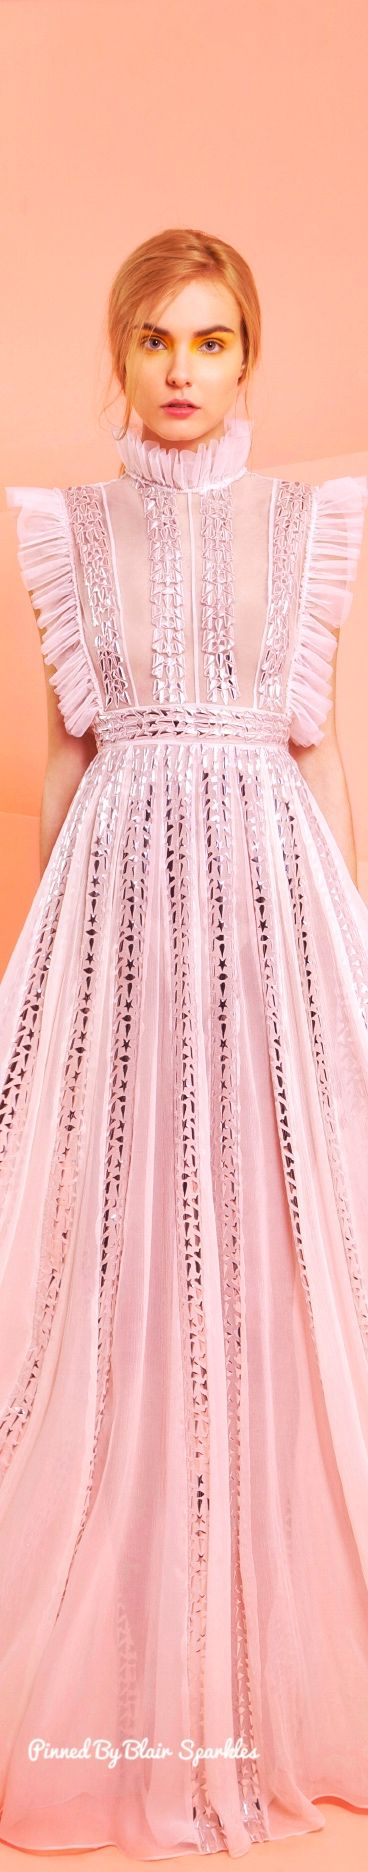 Rami Kadi Spring Summer Couture 2017 ♕♚εїз | BLAIR SPARKLES |